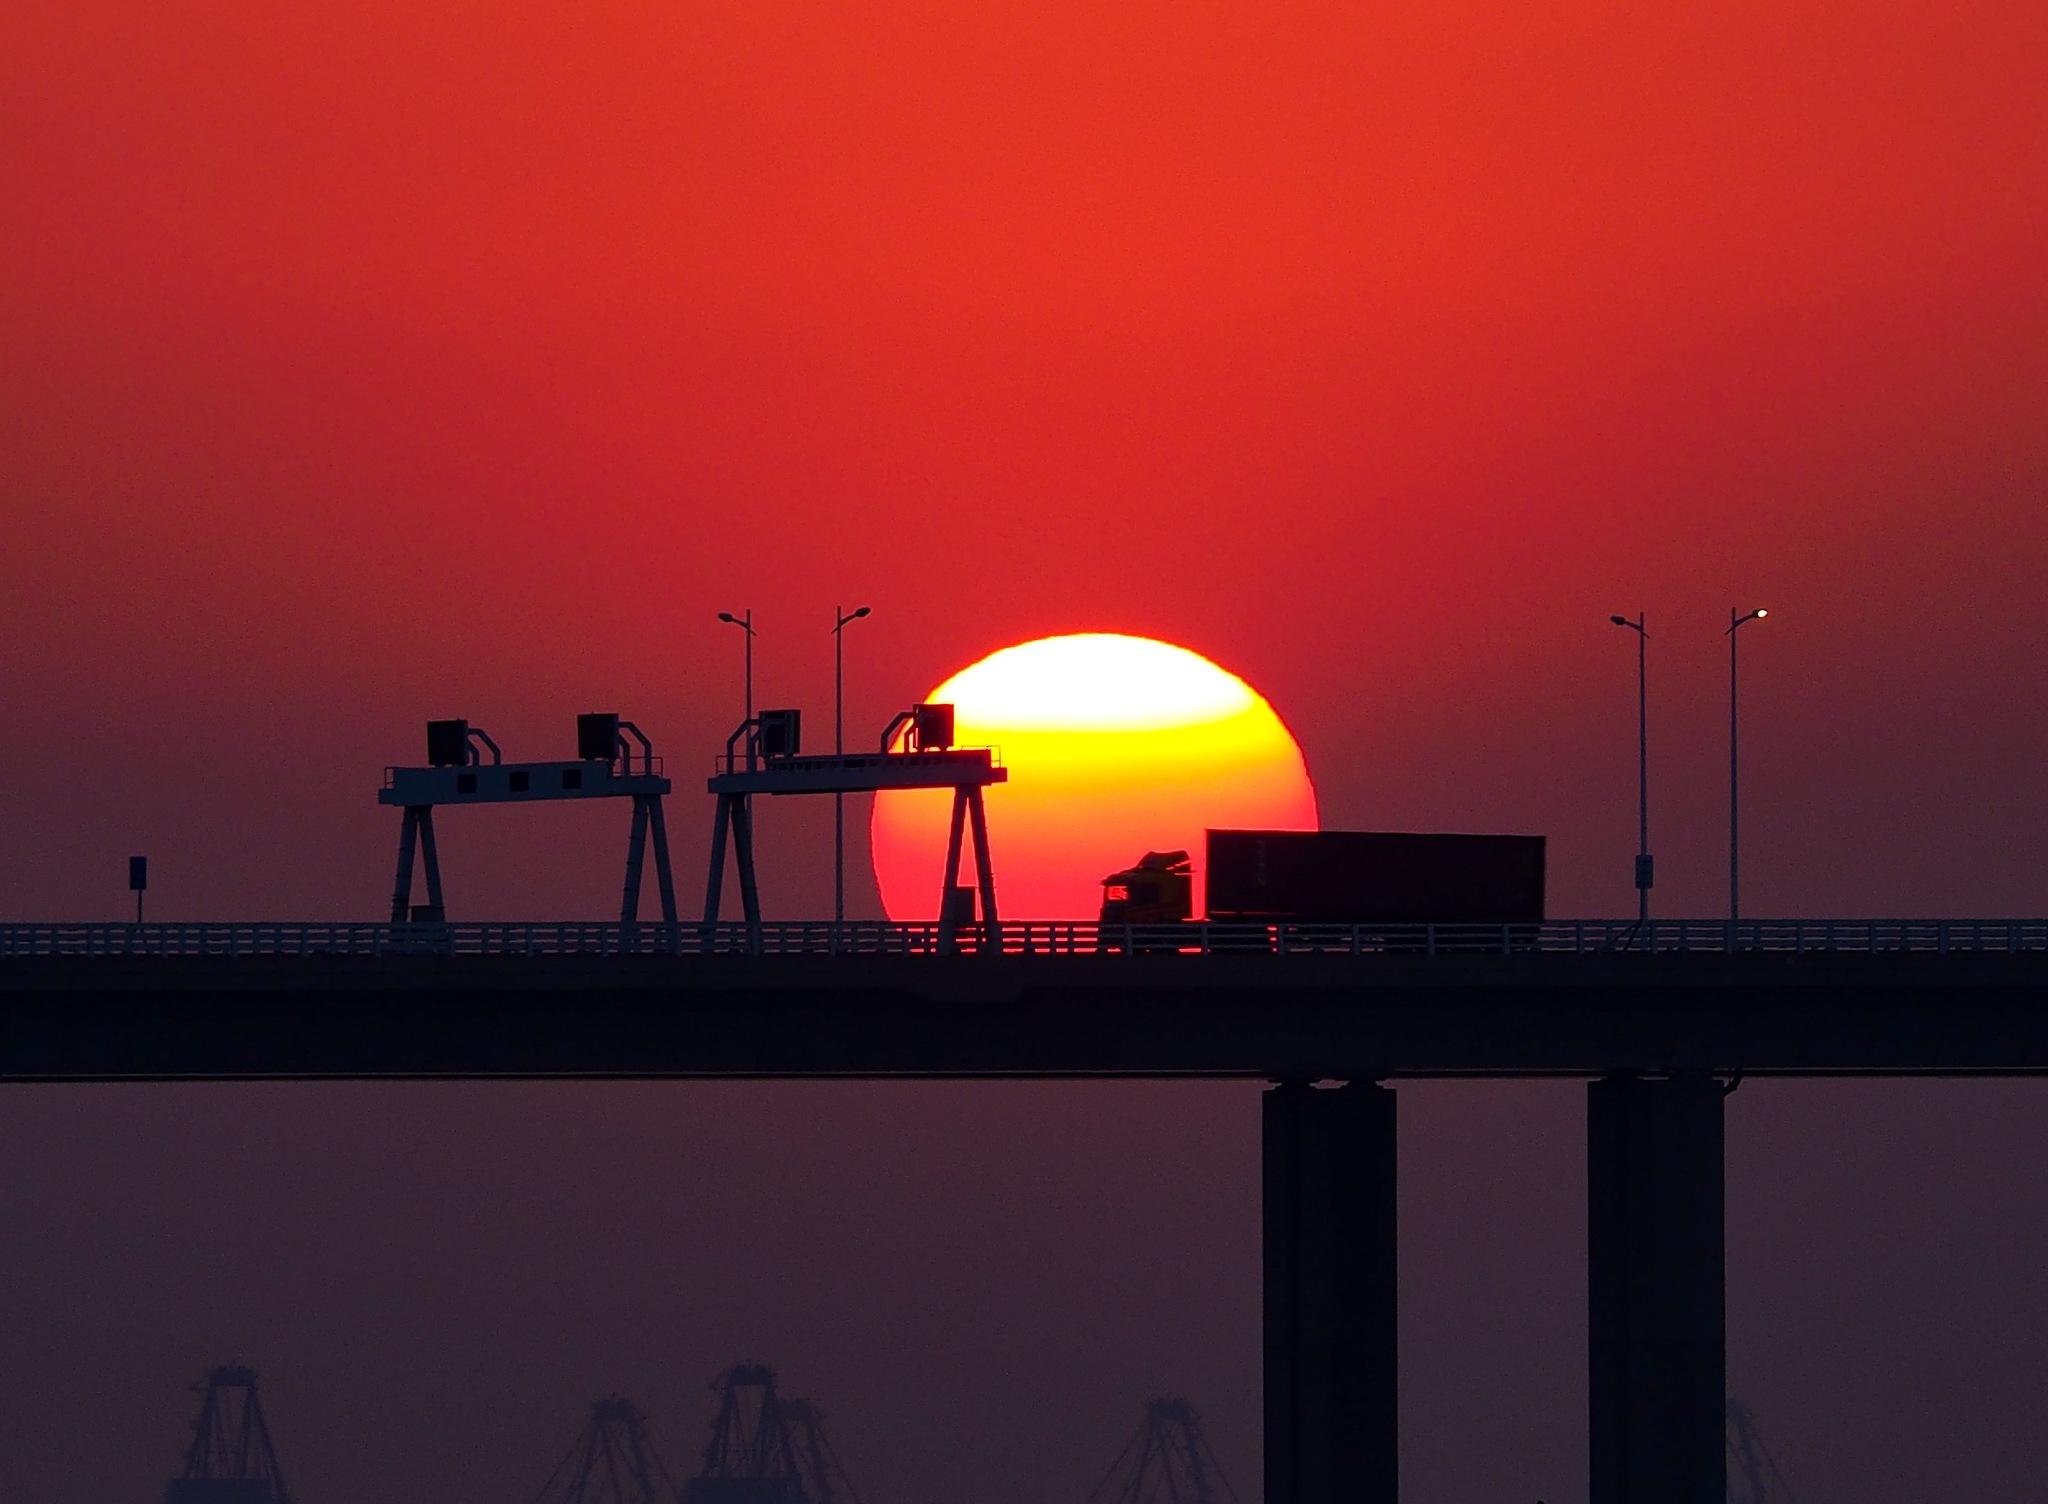 Sunset on bridge by David SK Yu